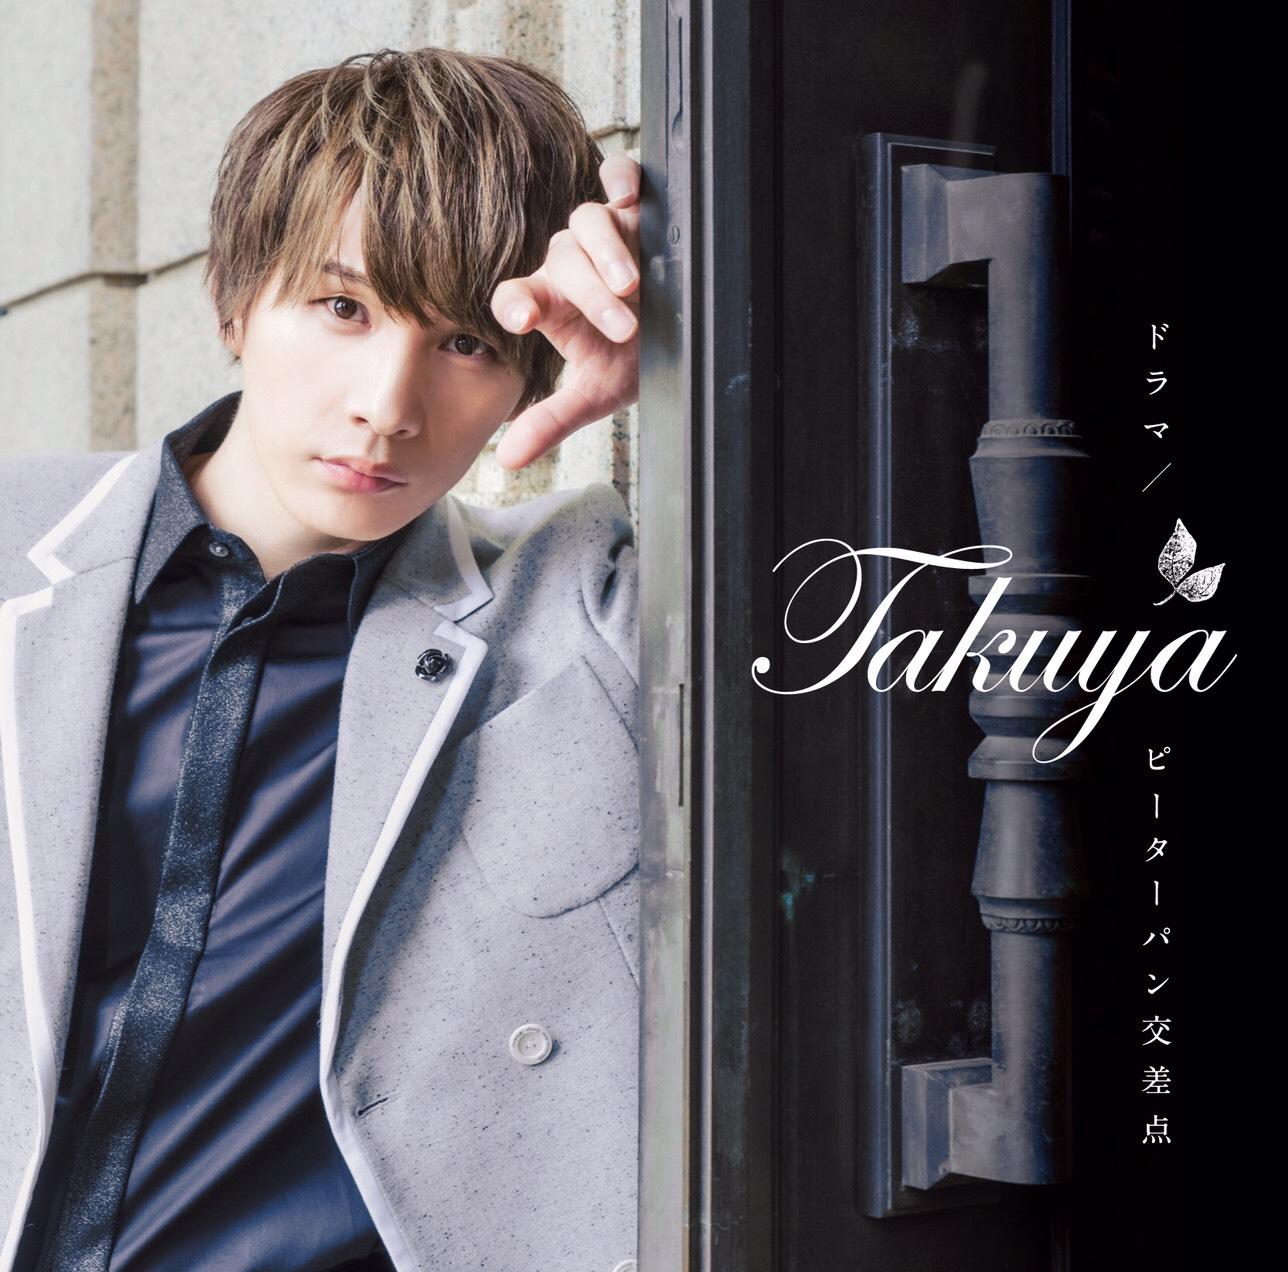 Takuya「ドラマ / ピーターパン交差点」TYPE-B